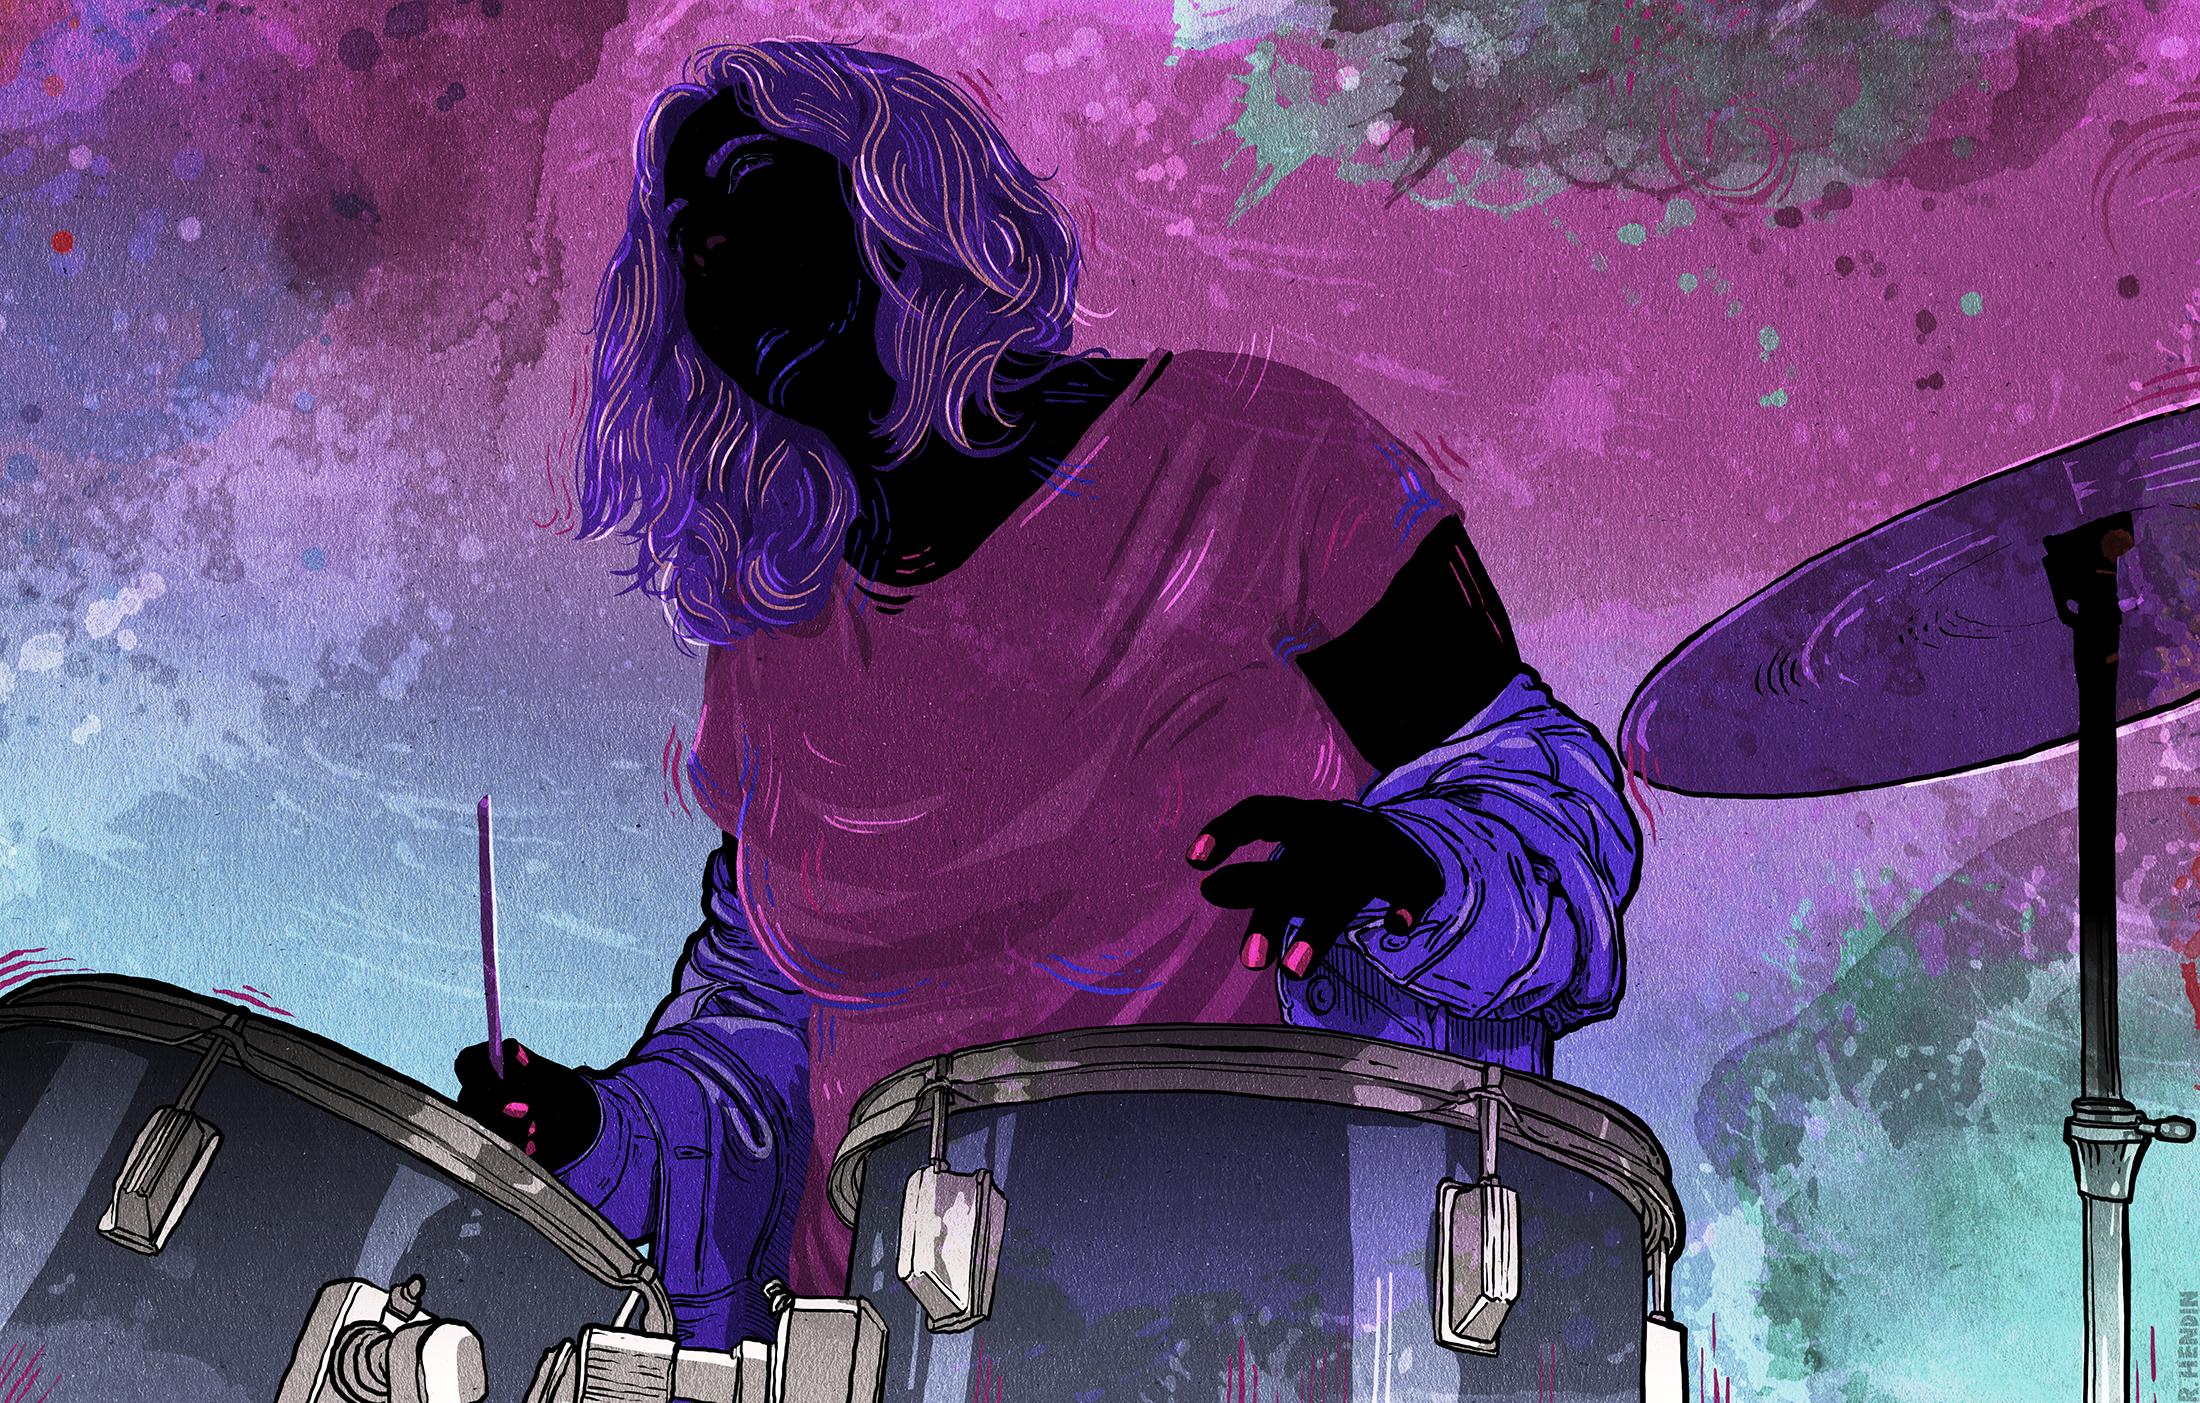 rebecca-hendin-self-harm-drumming-india-illustration-1